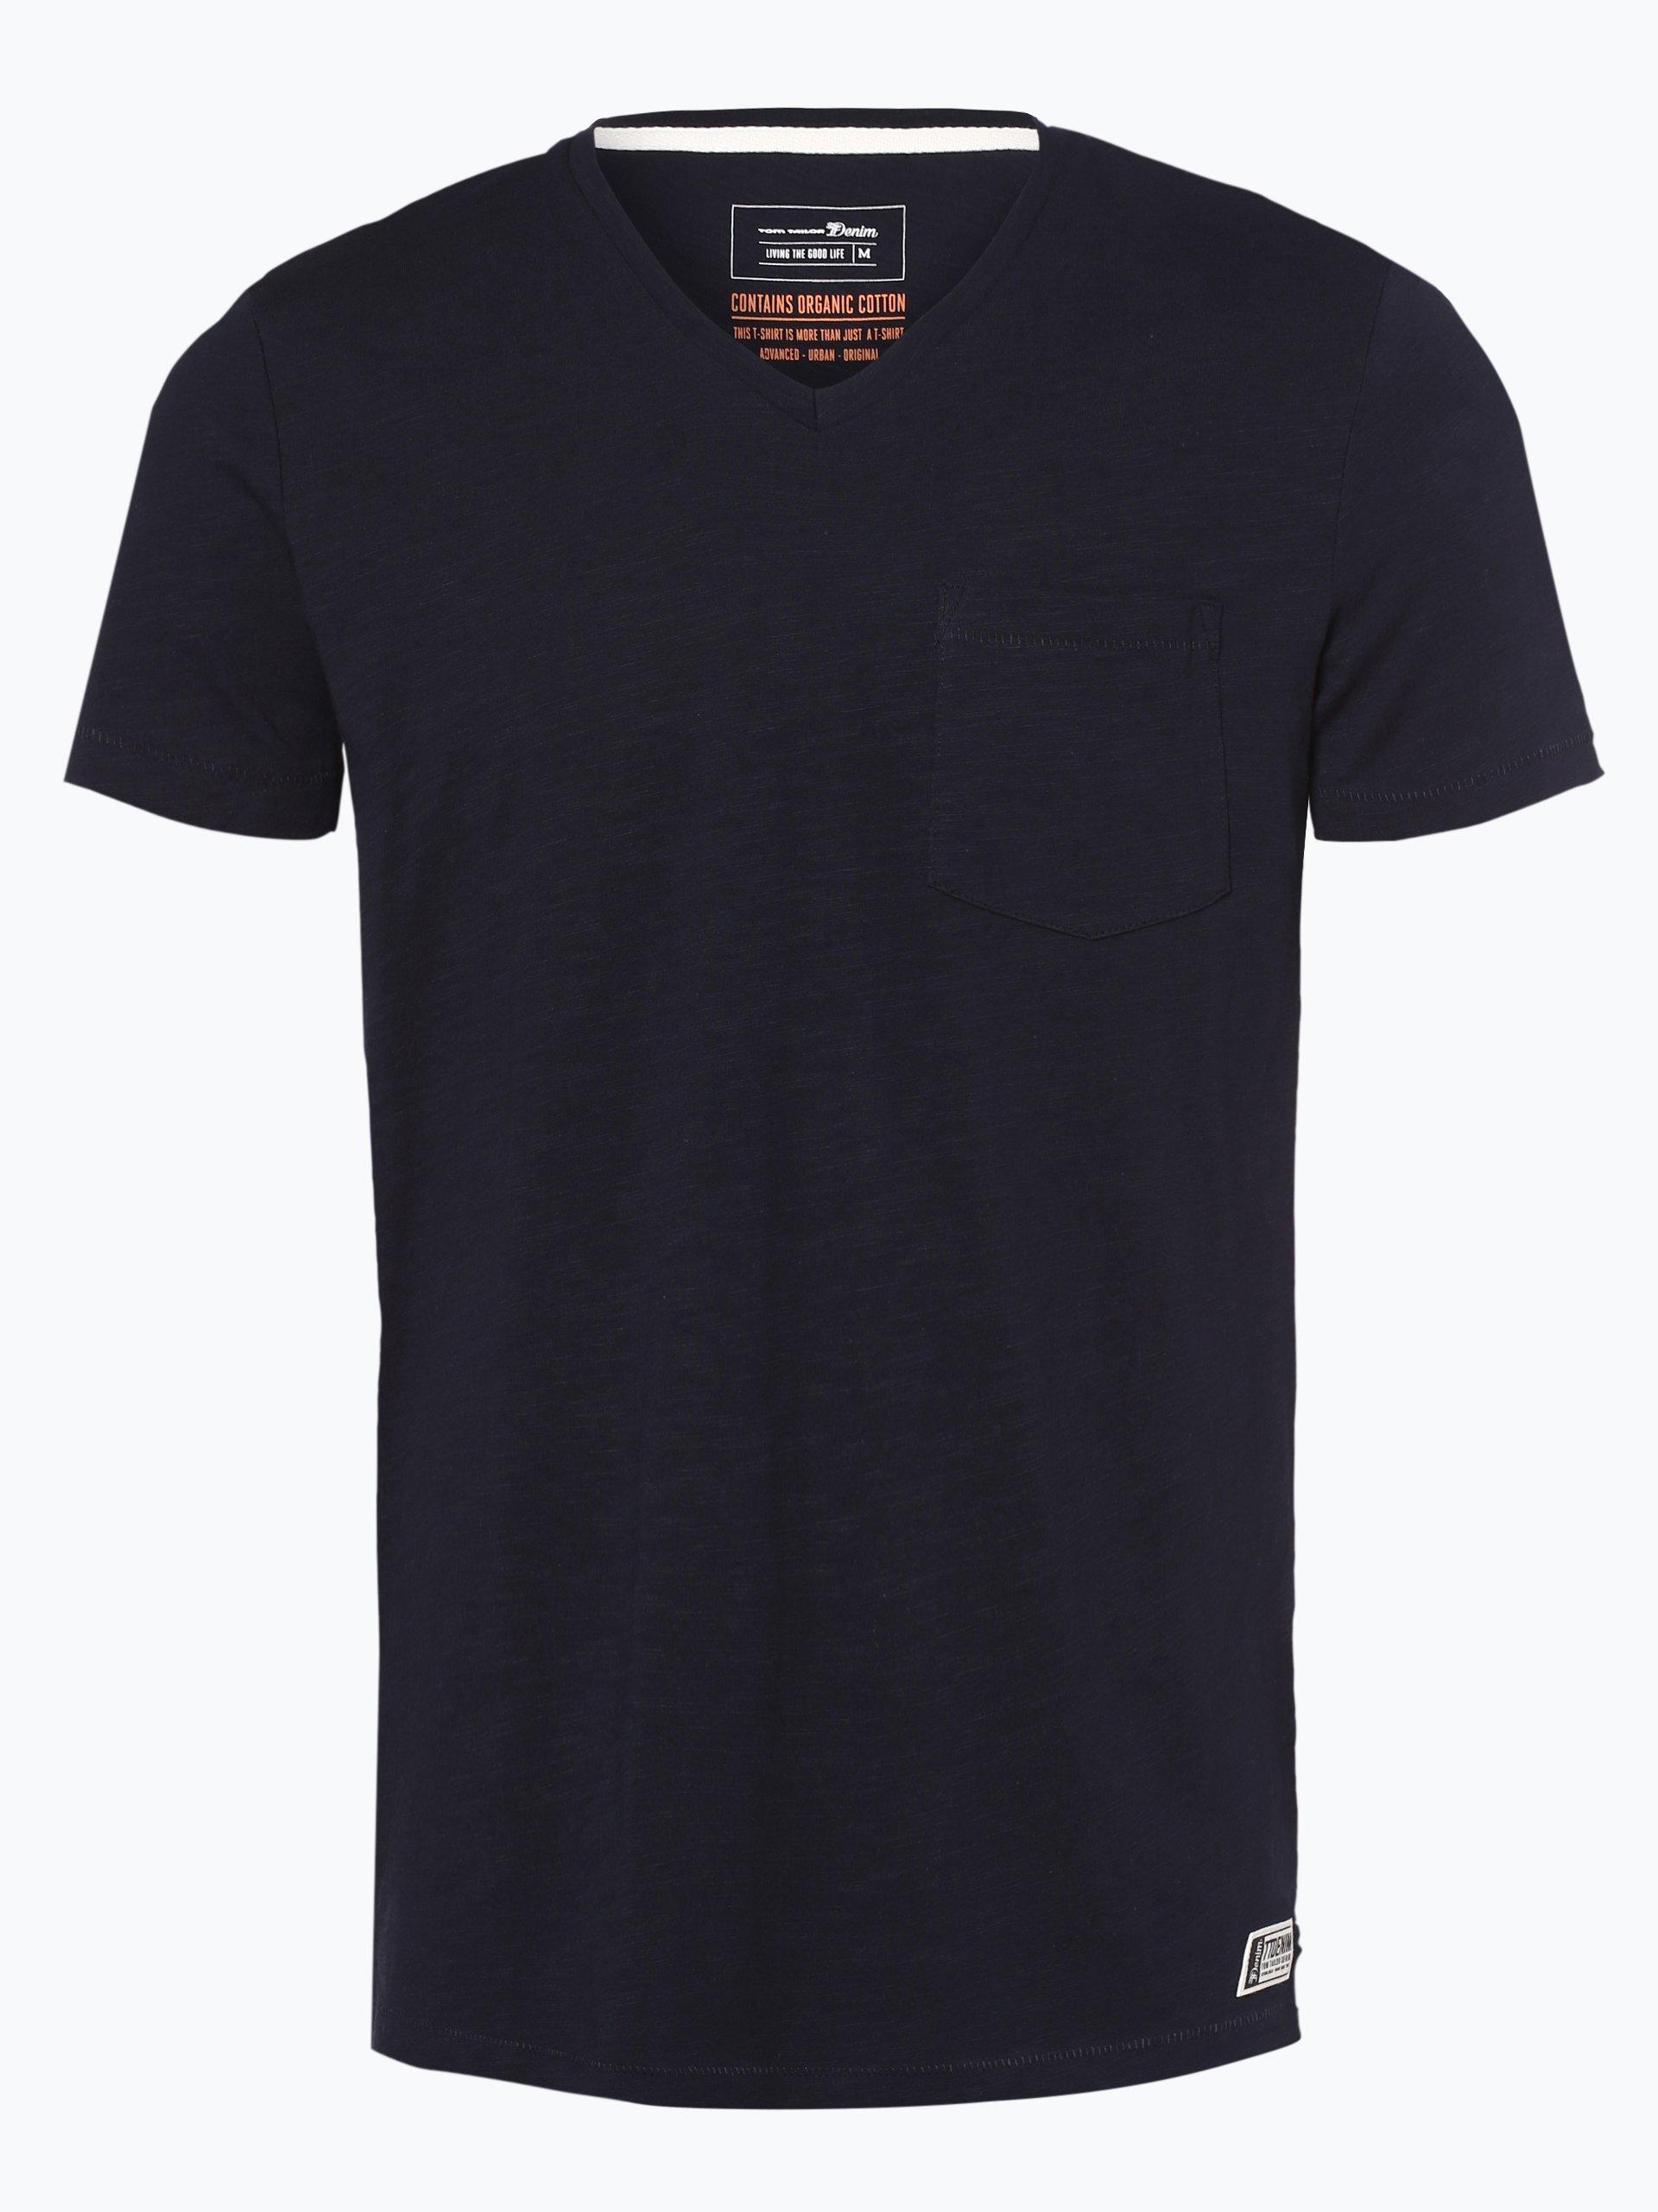 Tom Tailor Denim T-shirt męski